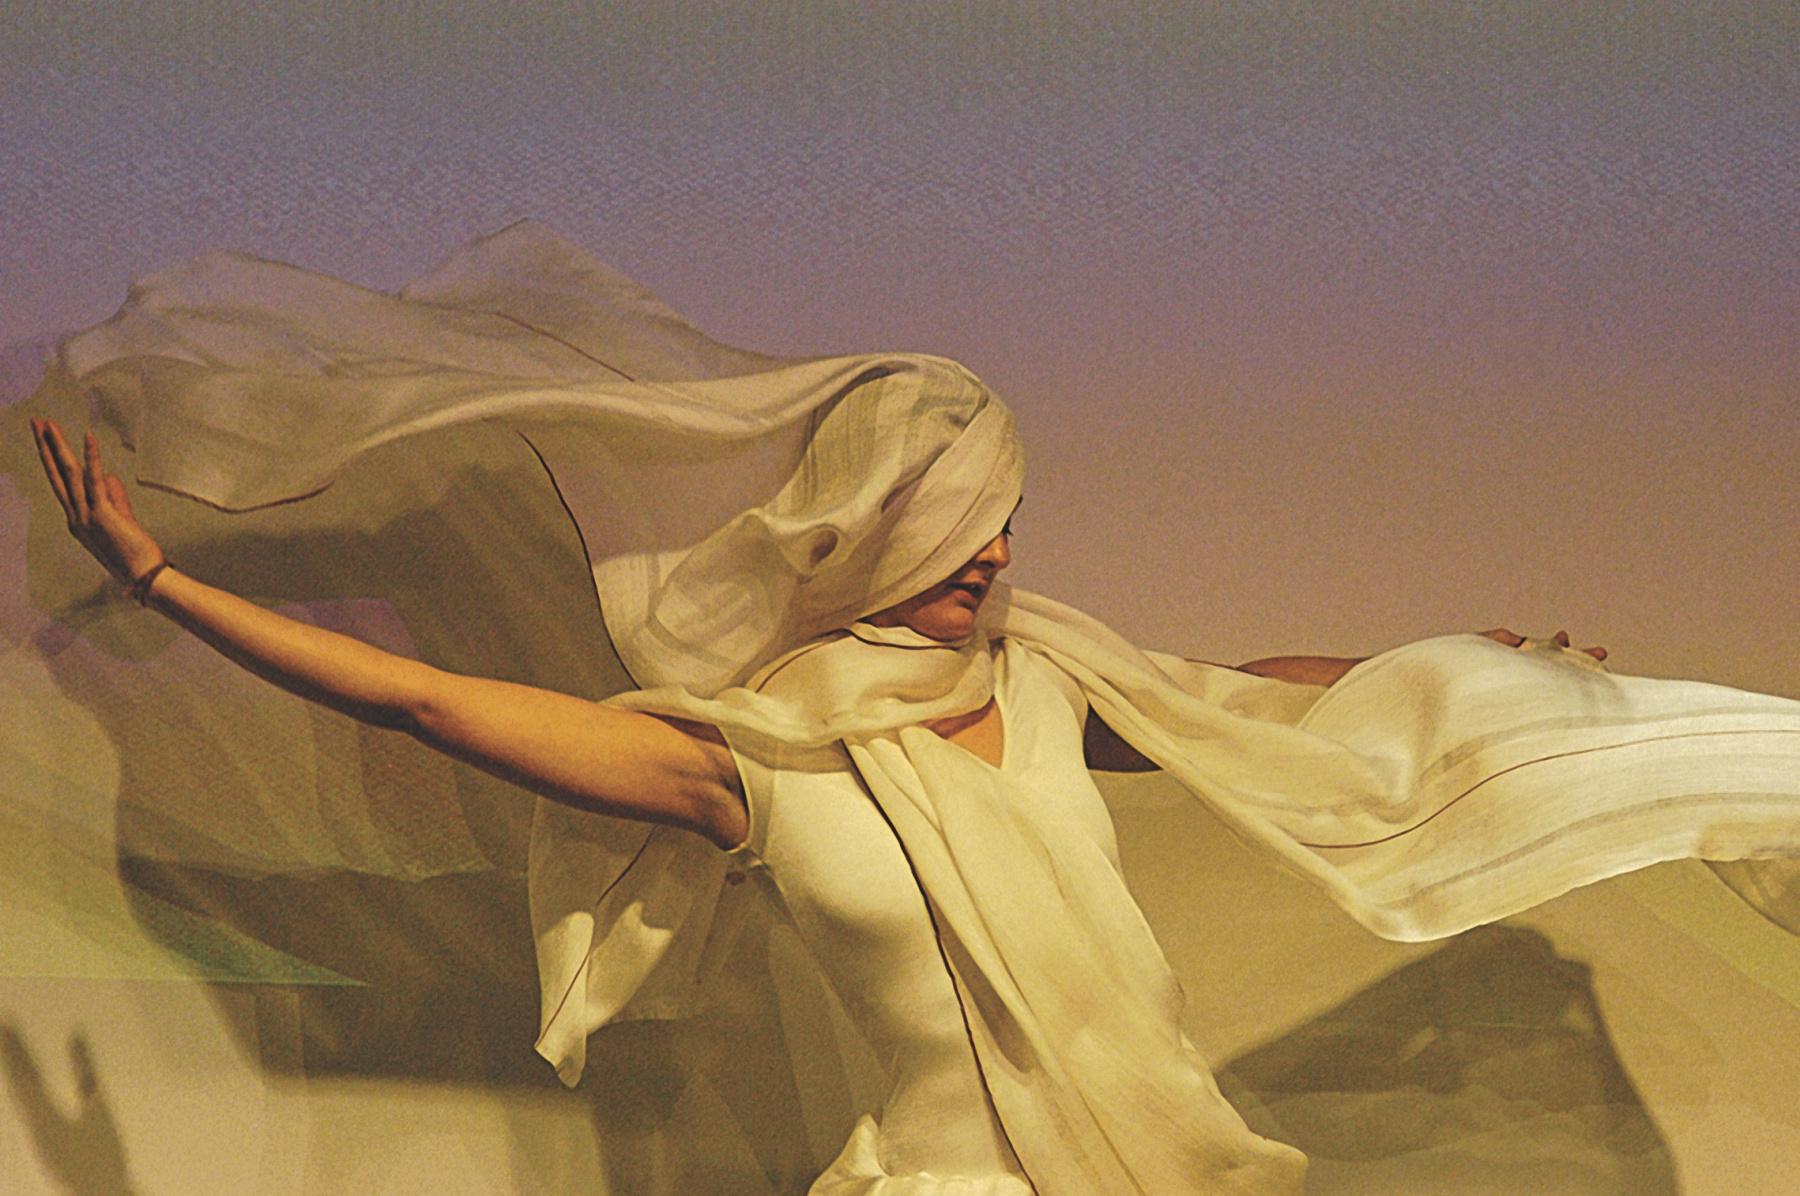 Rezia-Wahid-Image2-wovenair-dancing-Photo-credit-Elisabeth-Scheder-Bieschin_200